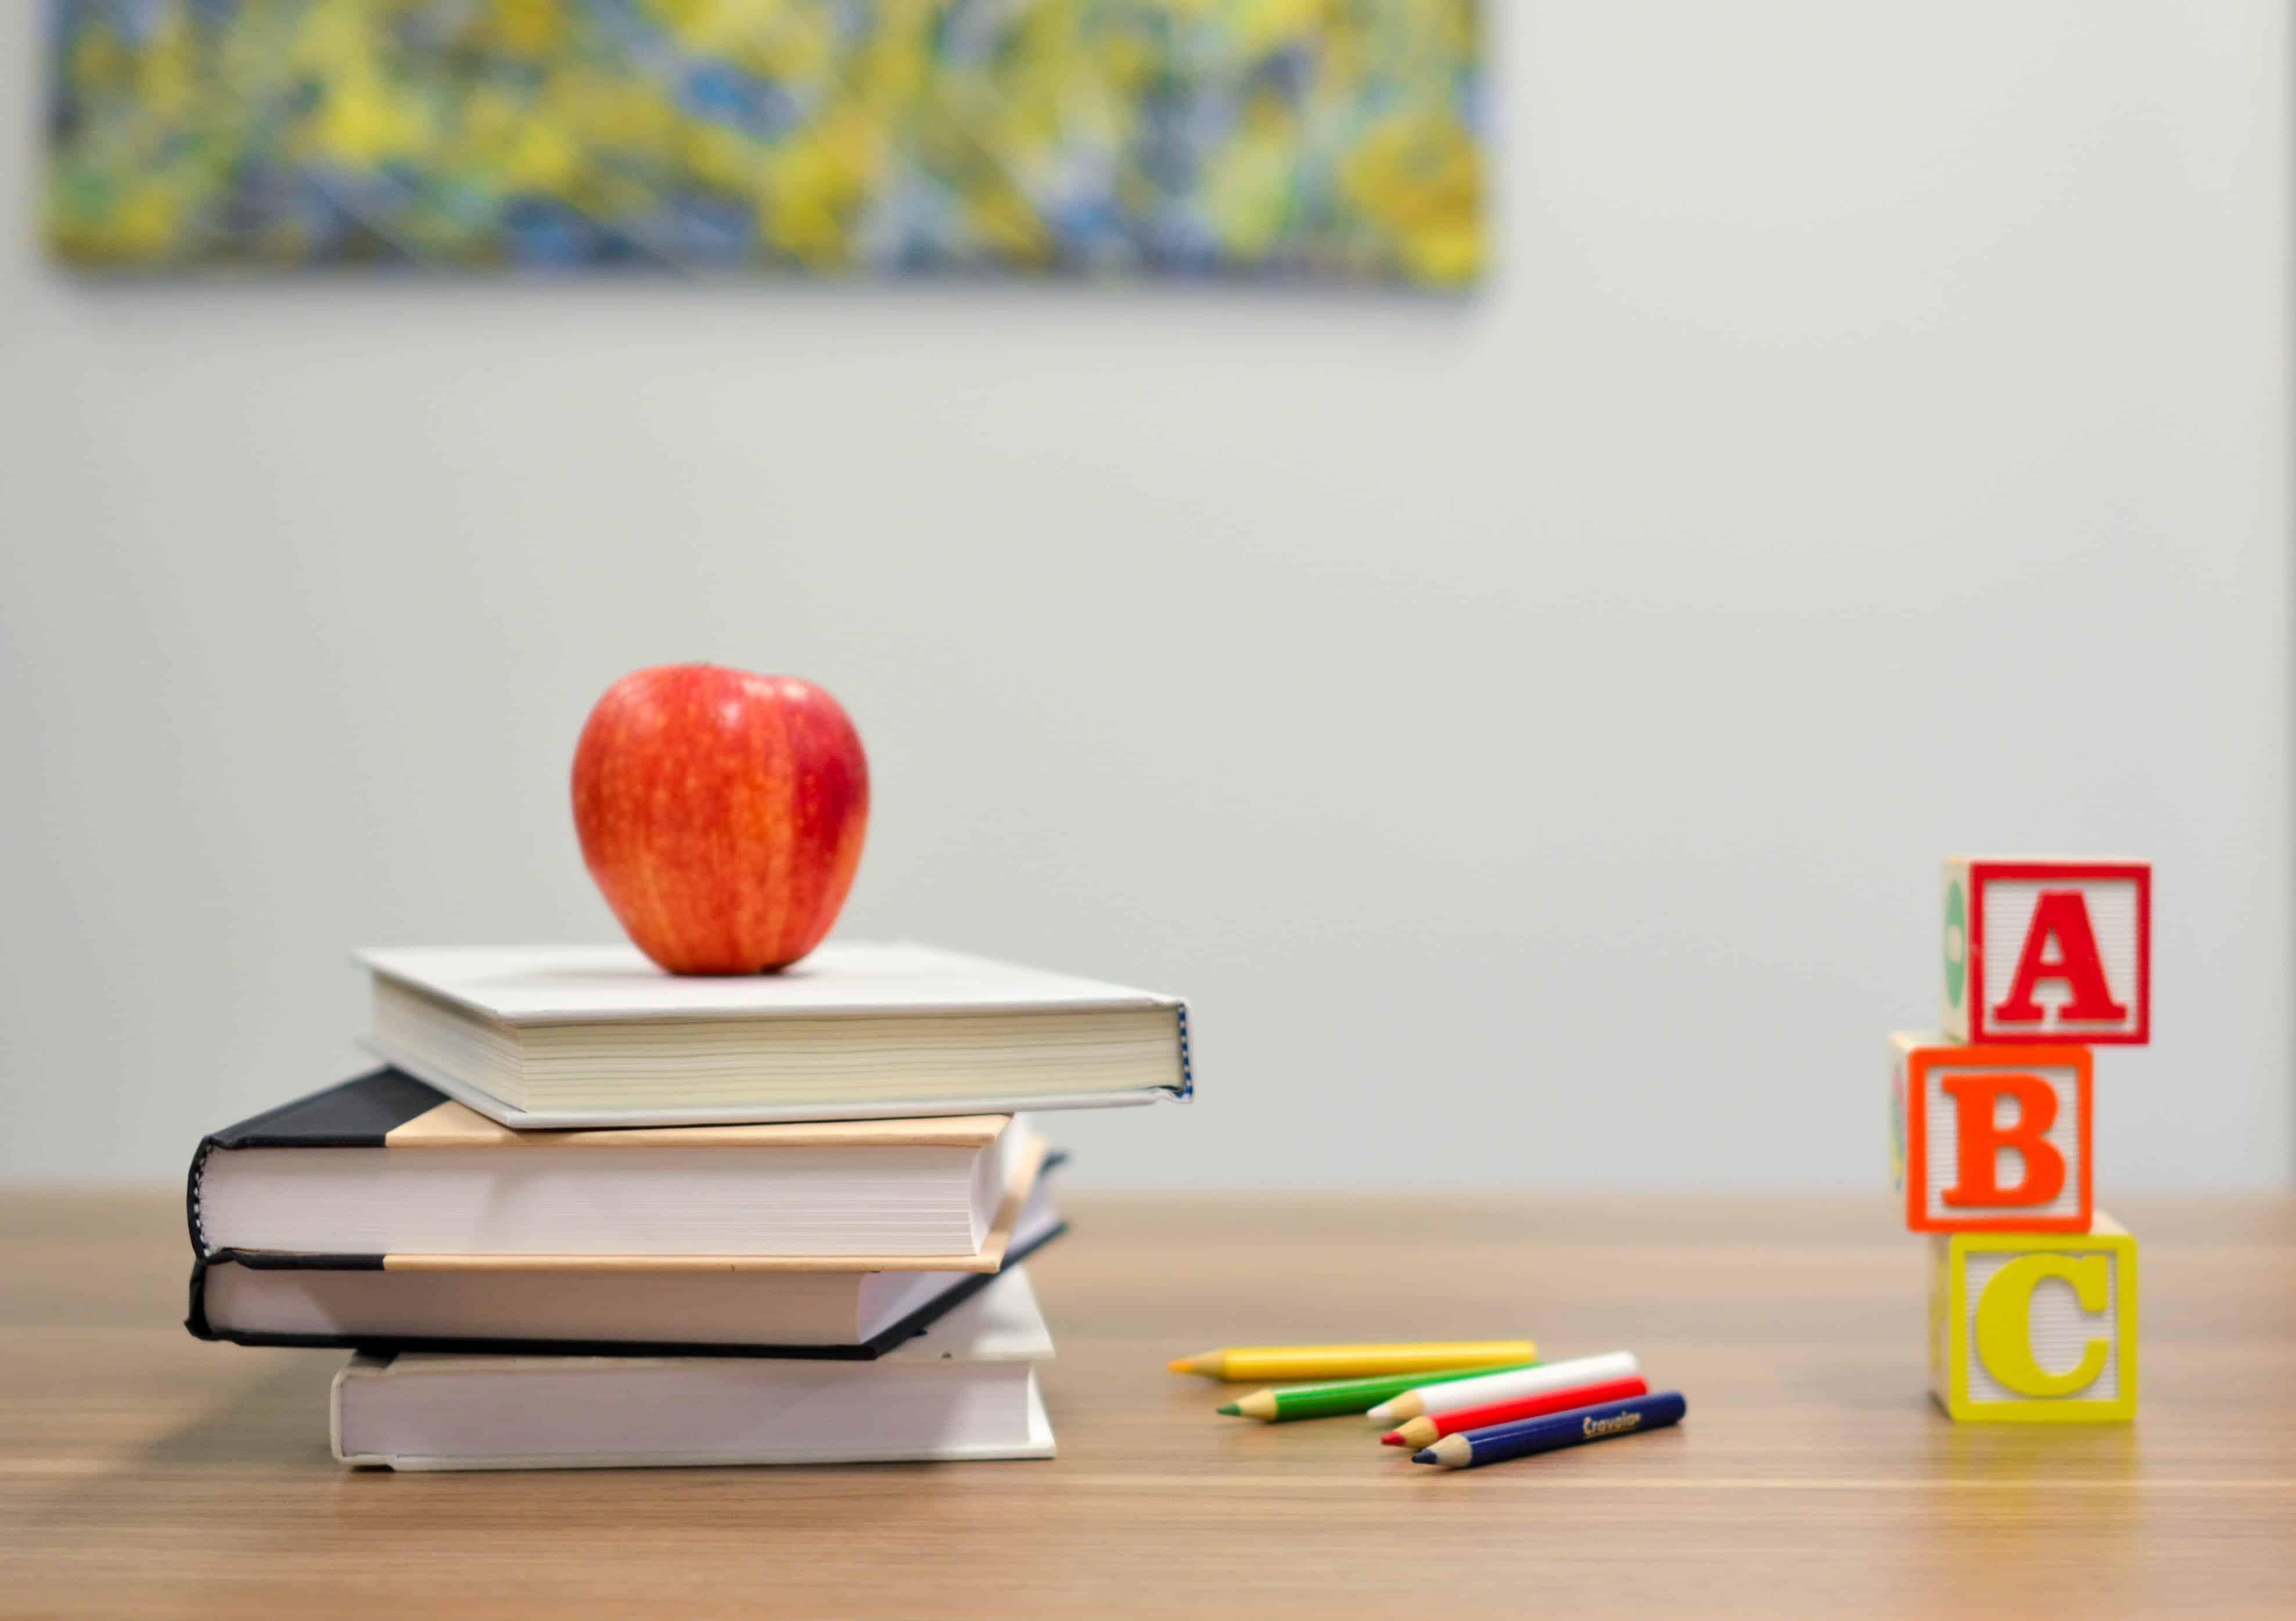 Digital Marketing Courses: An Agency Alternative